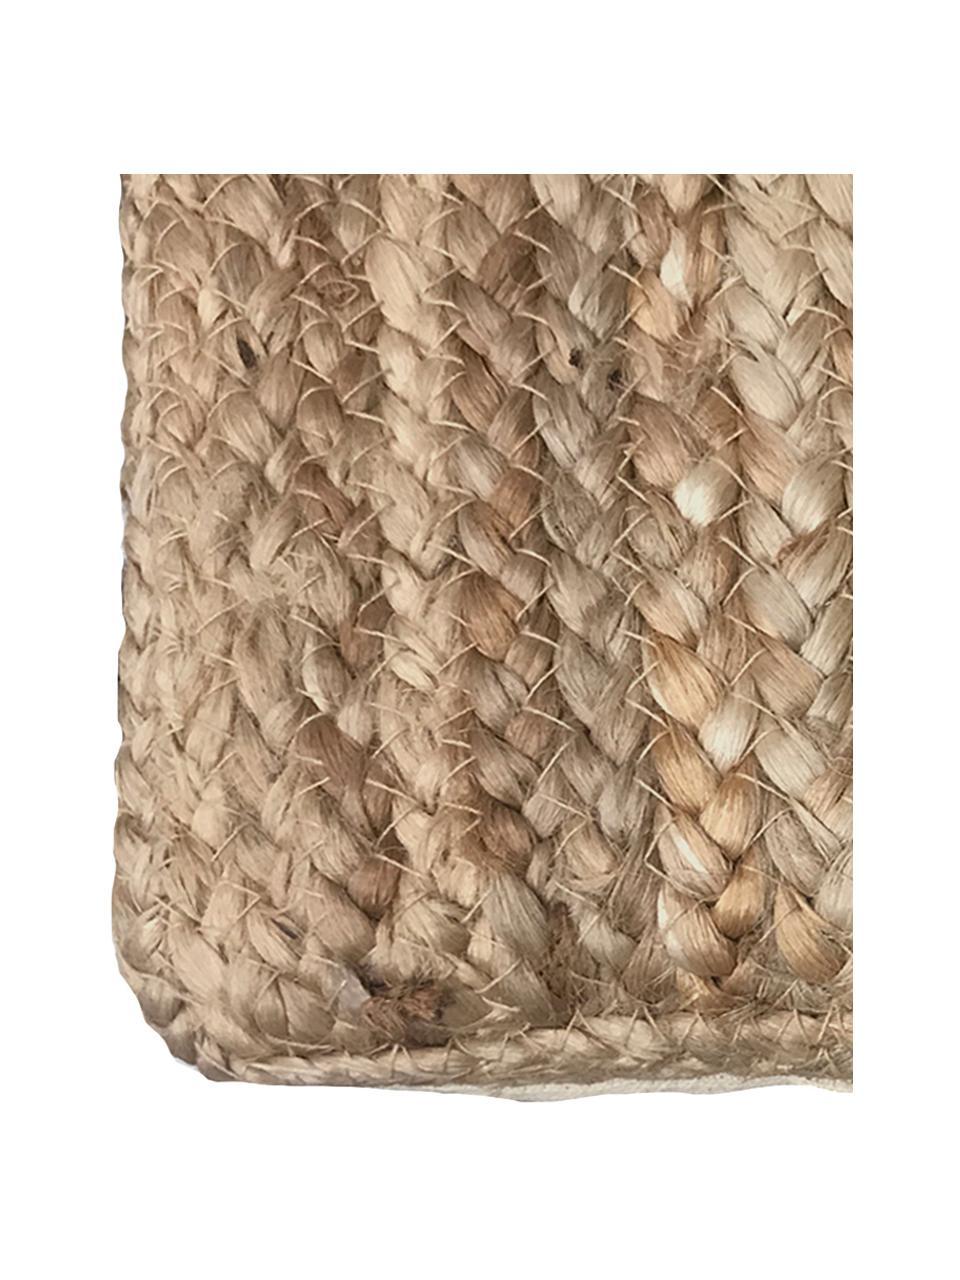 Jute-Kissenhülle Ural, Vorderseite: Jute, Rückseite: Baumwolle, Jute, 60 x 60 cm